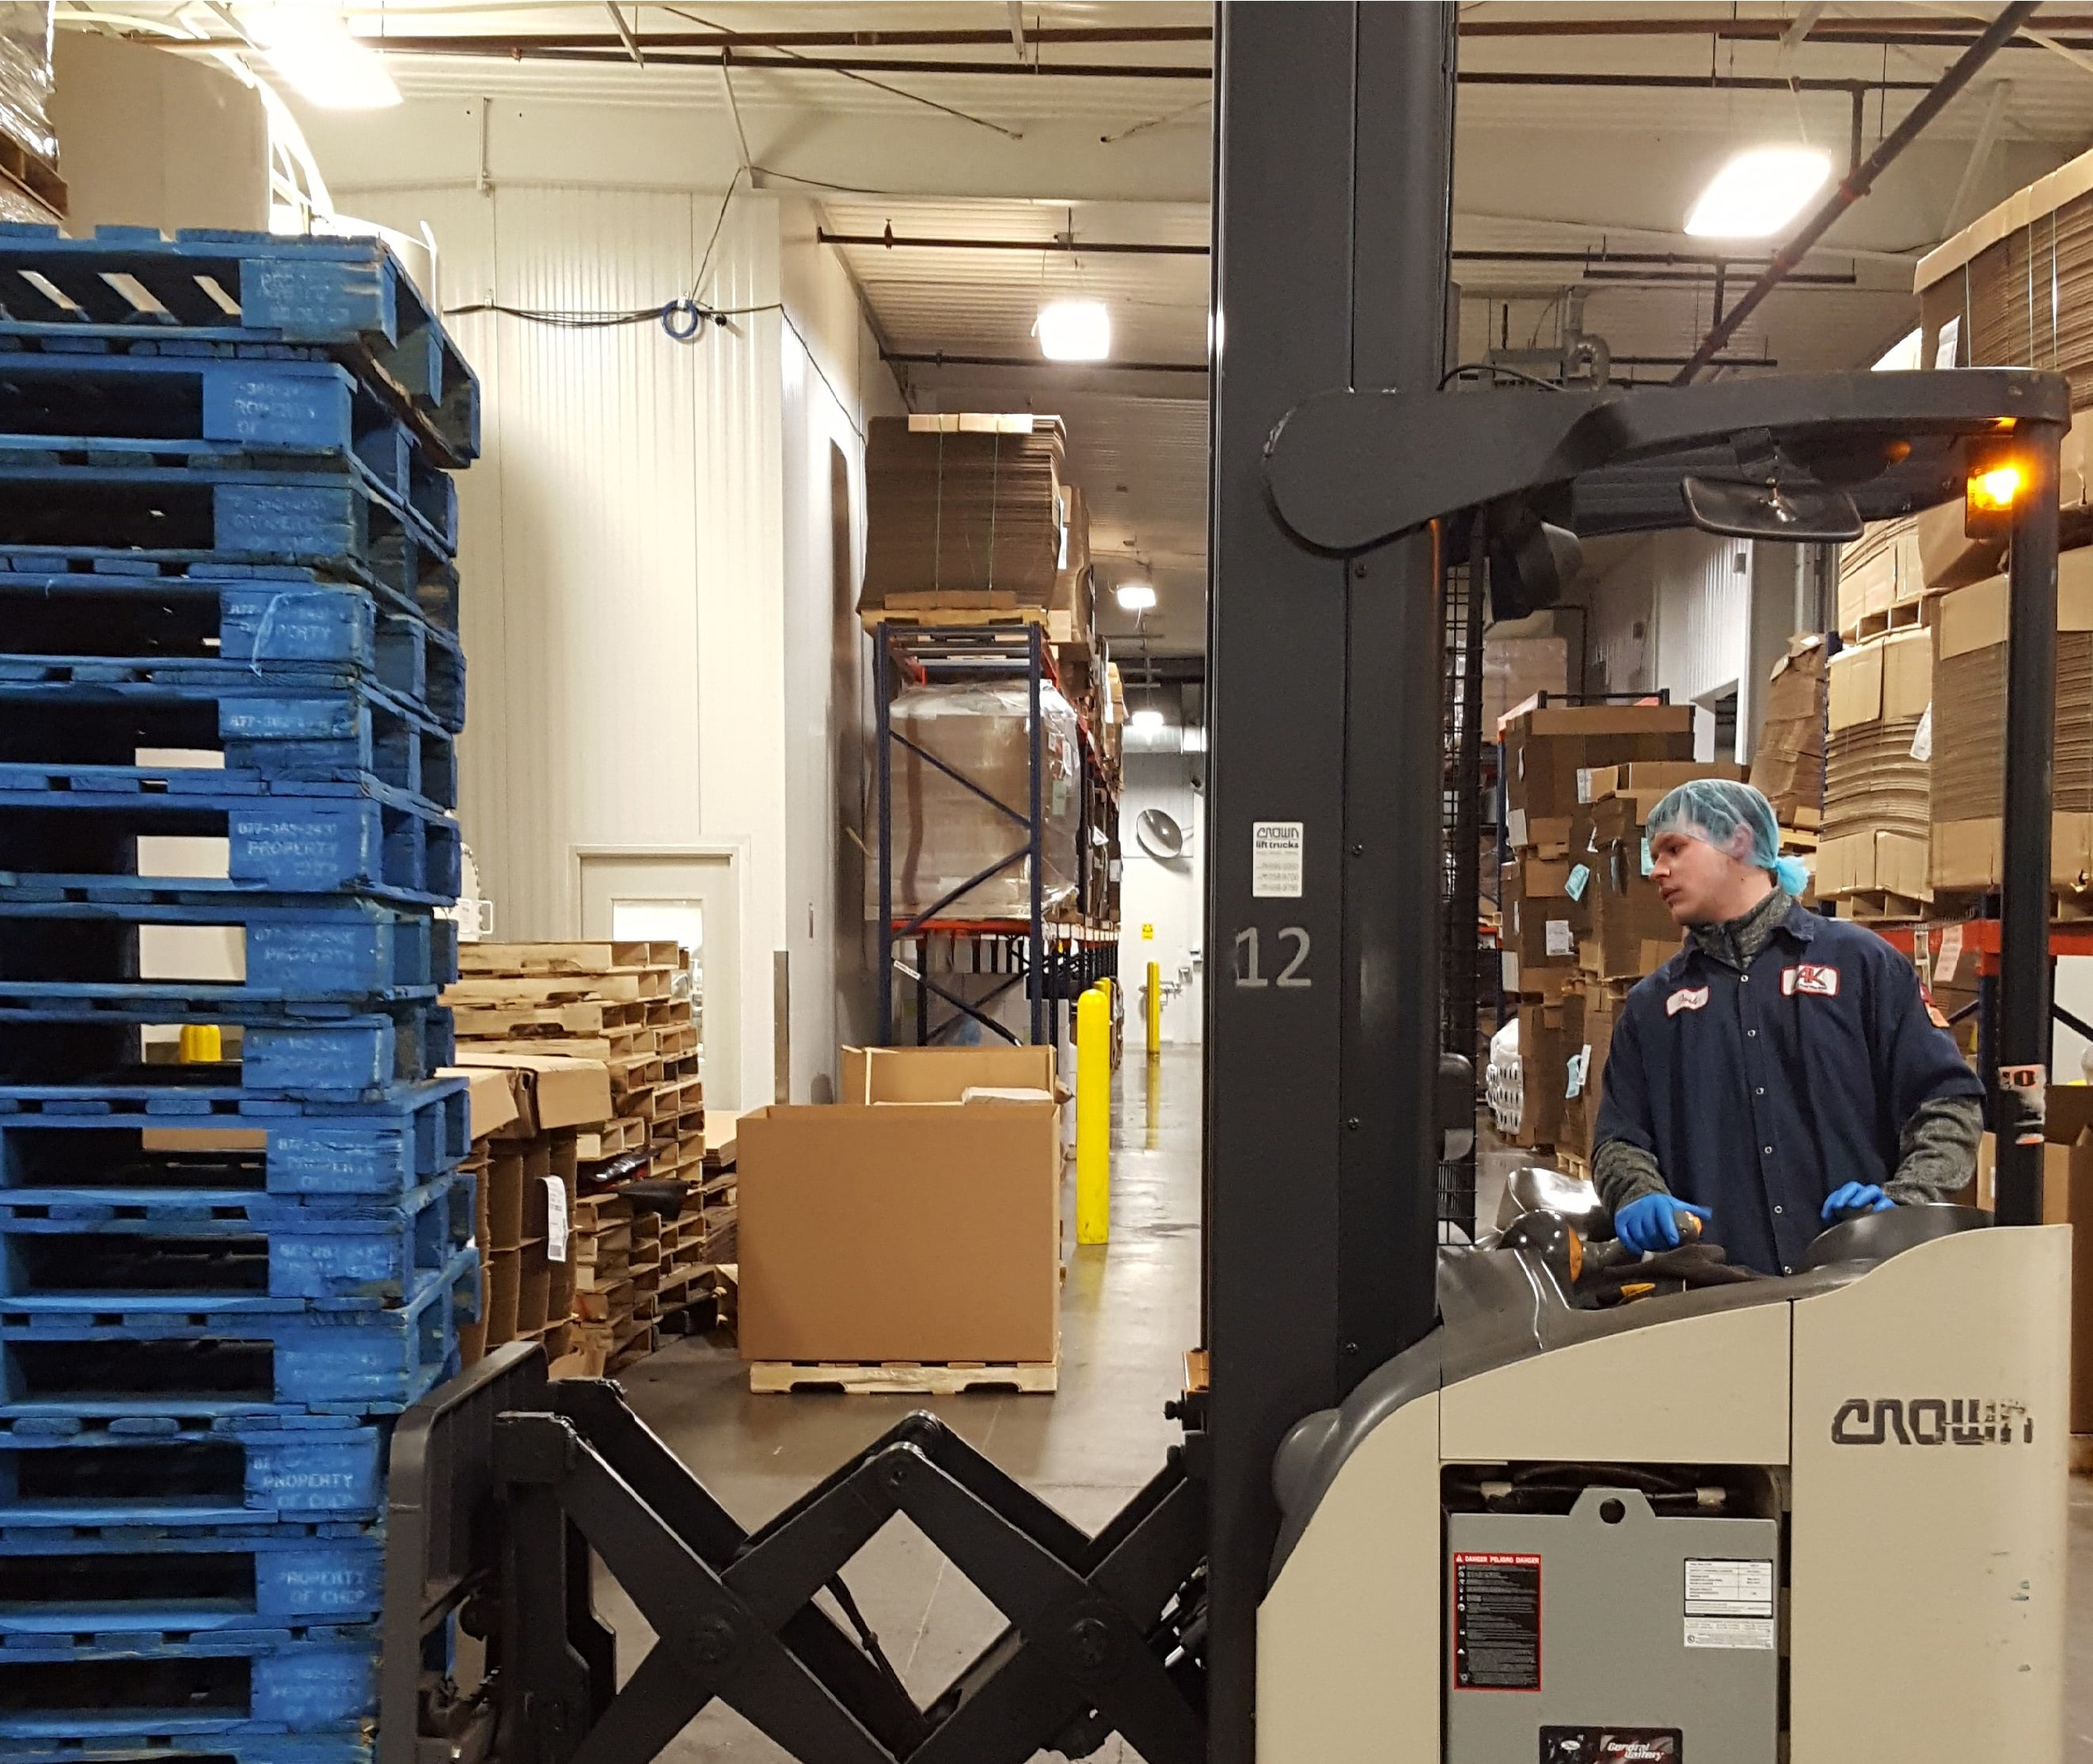 Jobs - Forklift, stand up edit